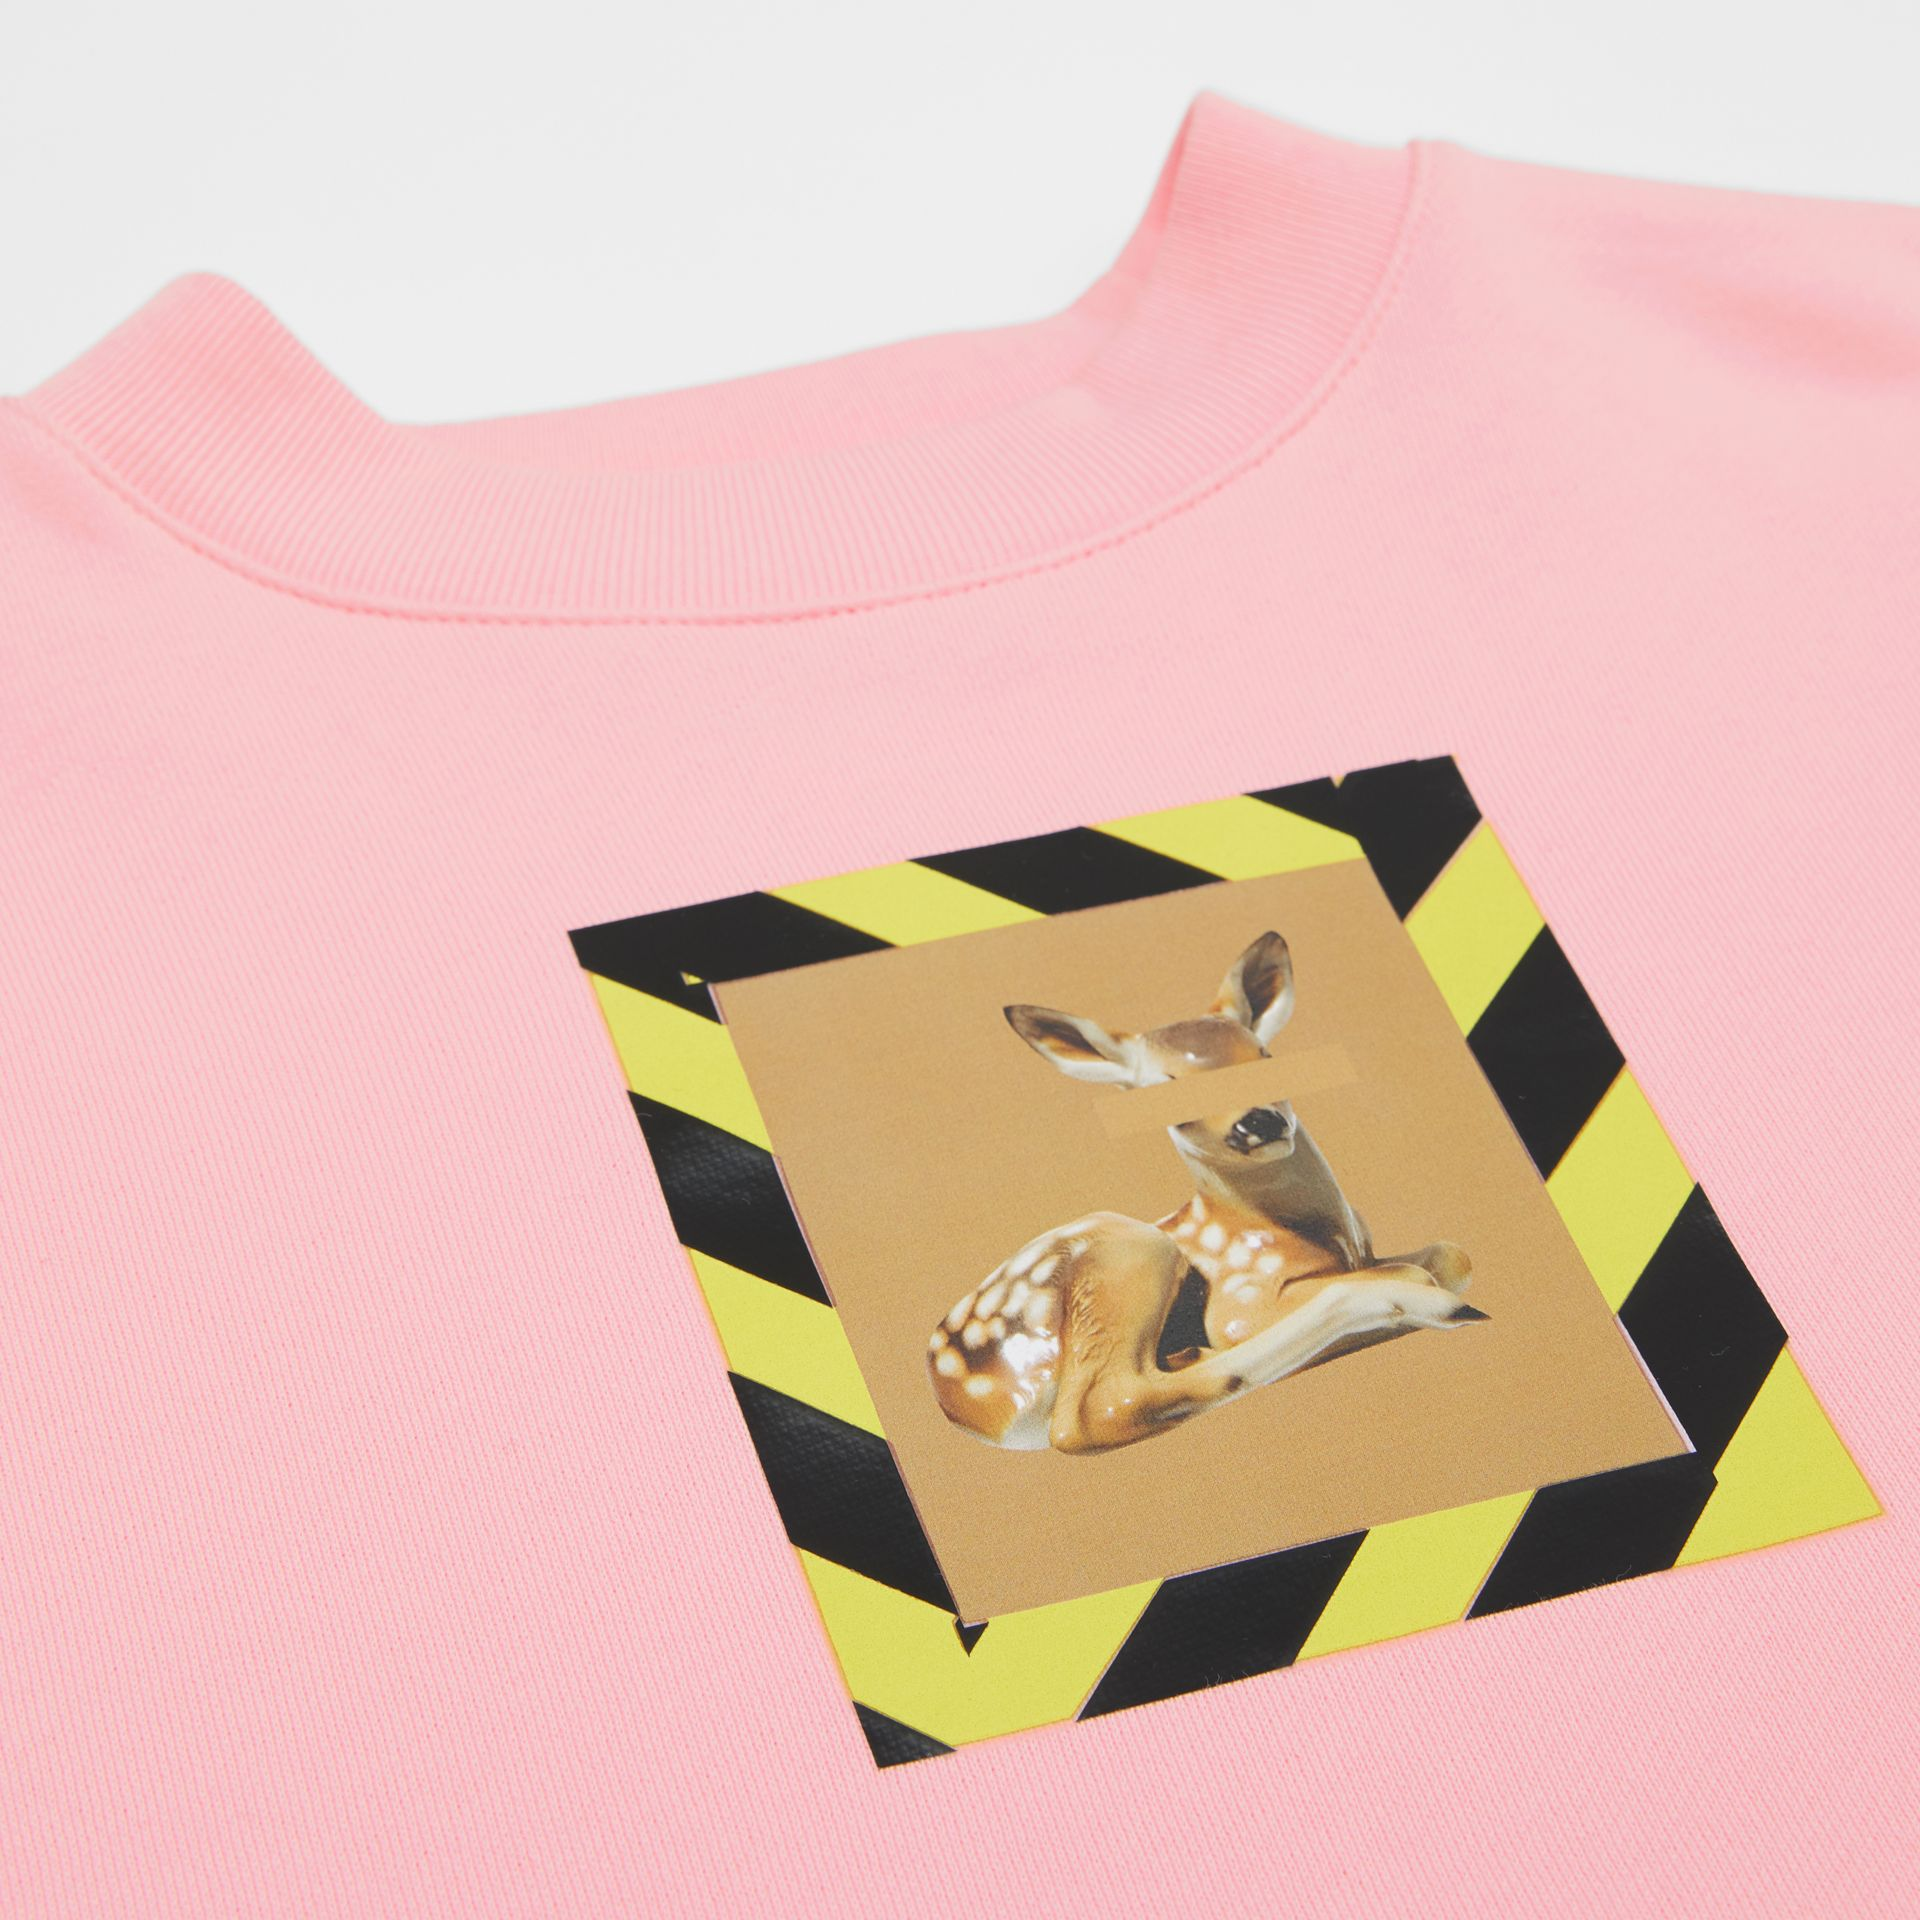 Deer Print Cotton Sweatshirt in Candy Pink | Burberry Australia - gallery image 1